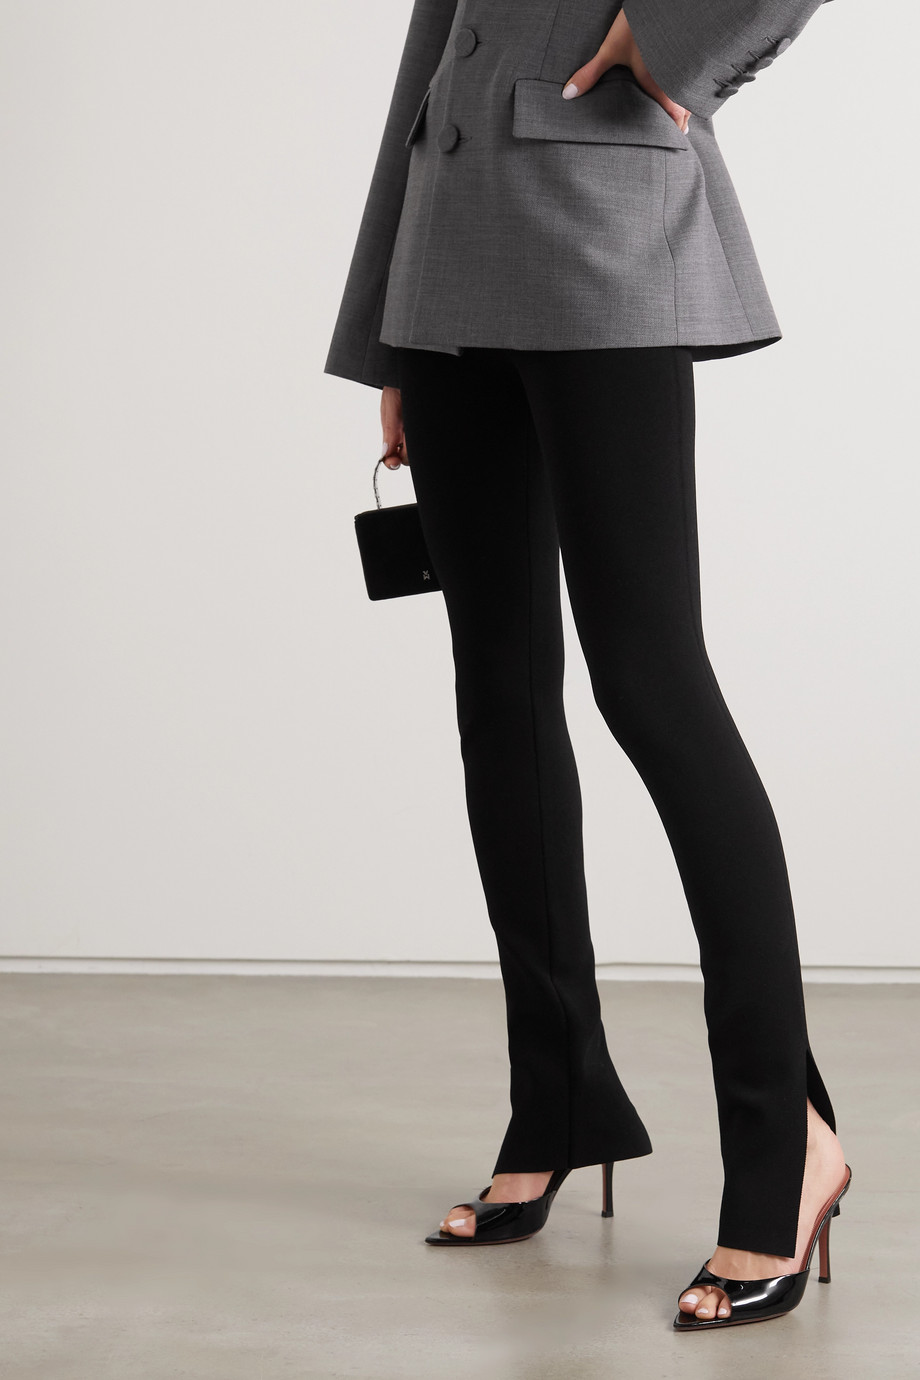 Amina Muaddi Caroline patent-leather mules